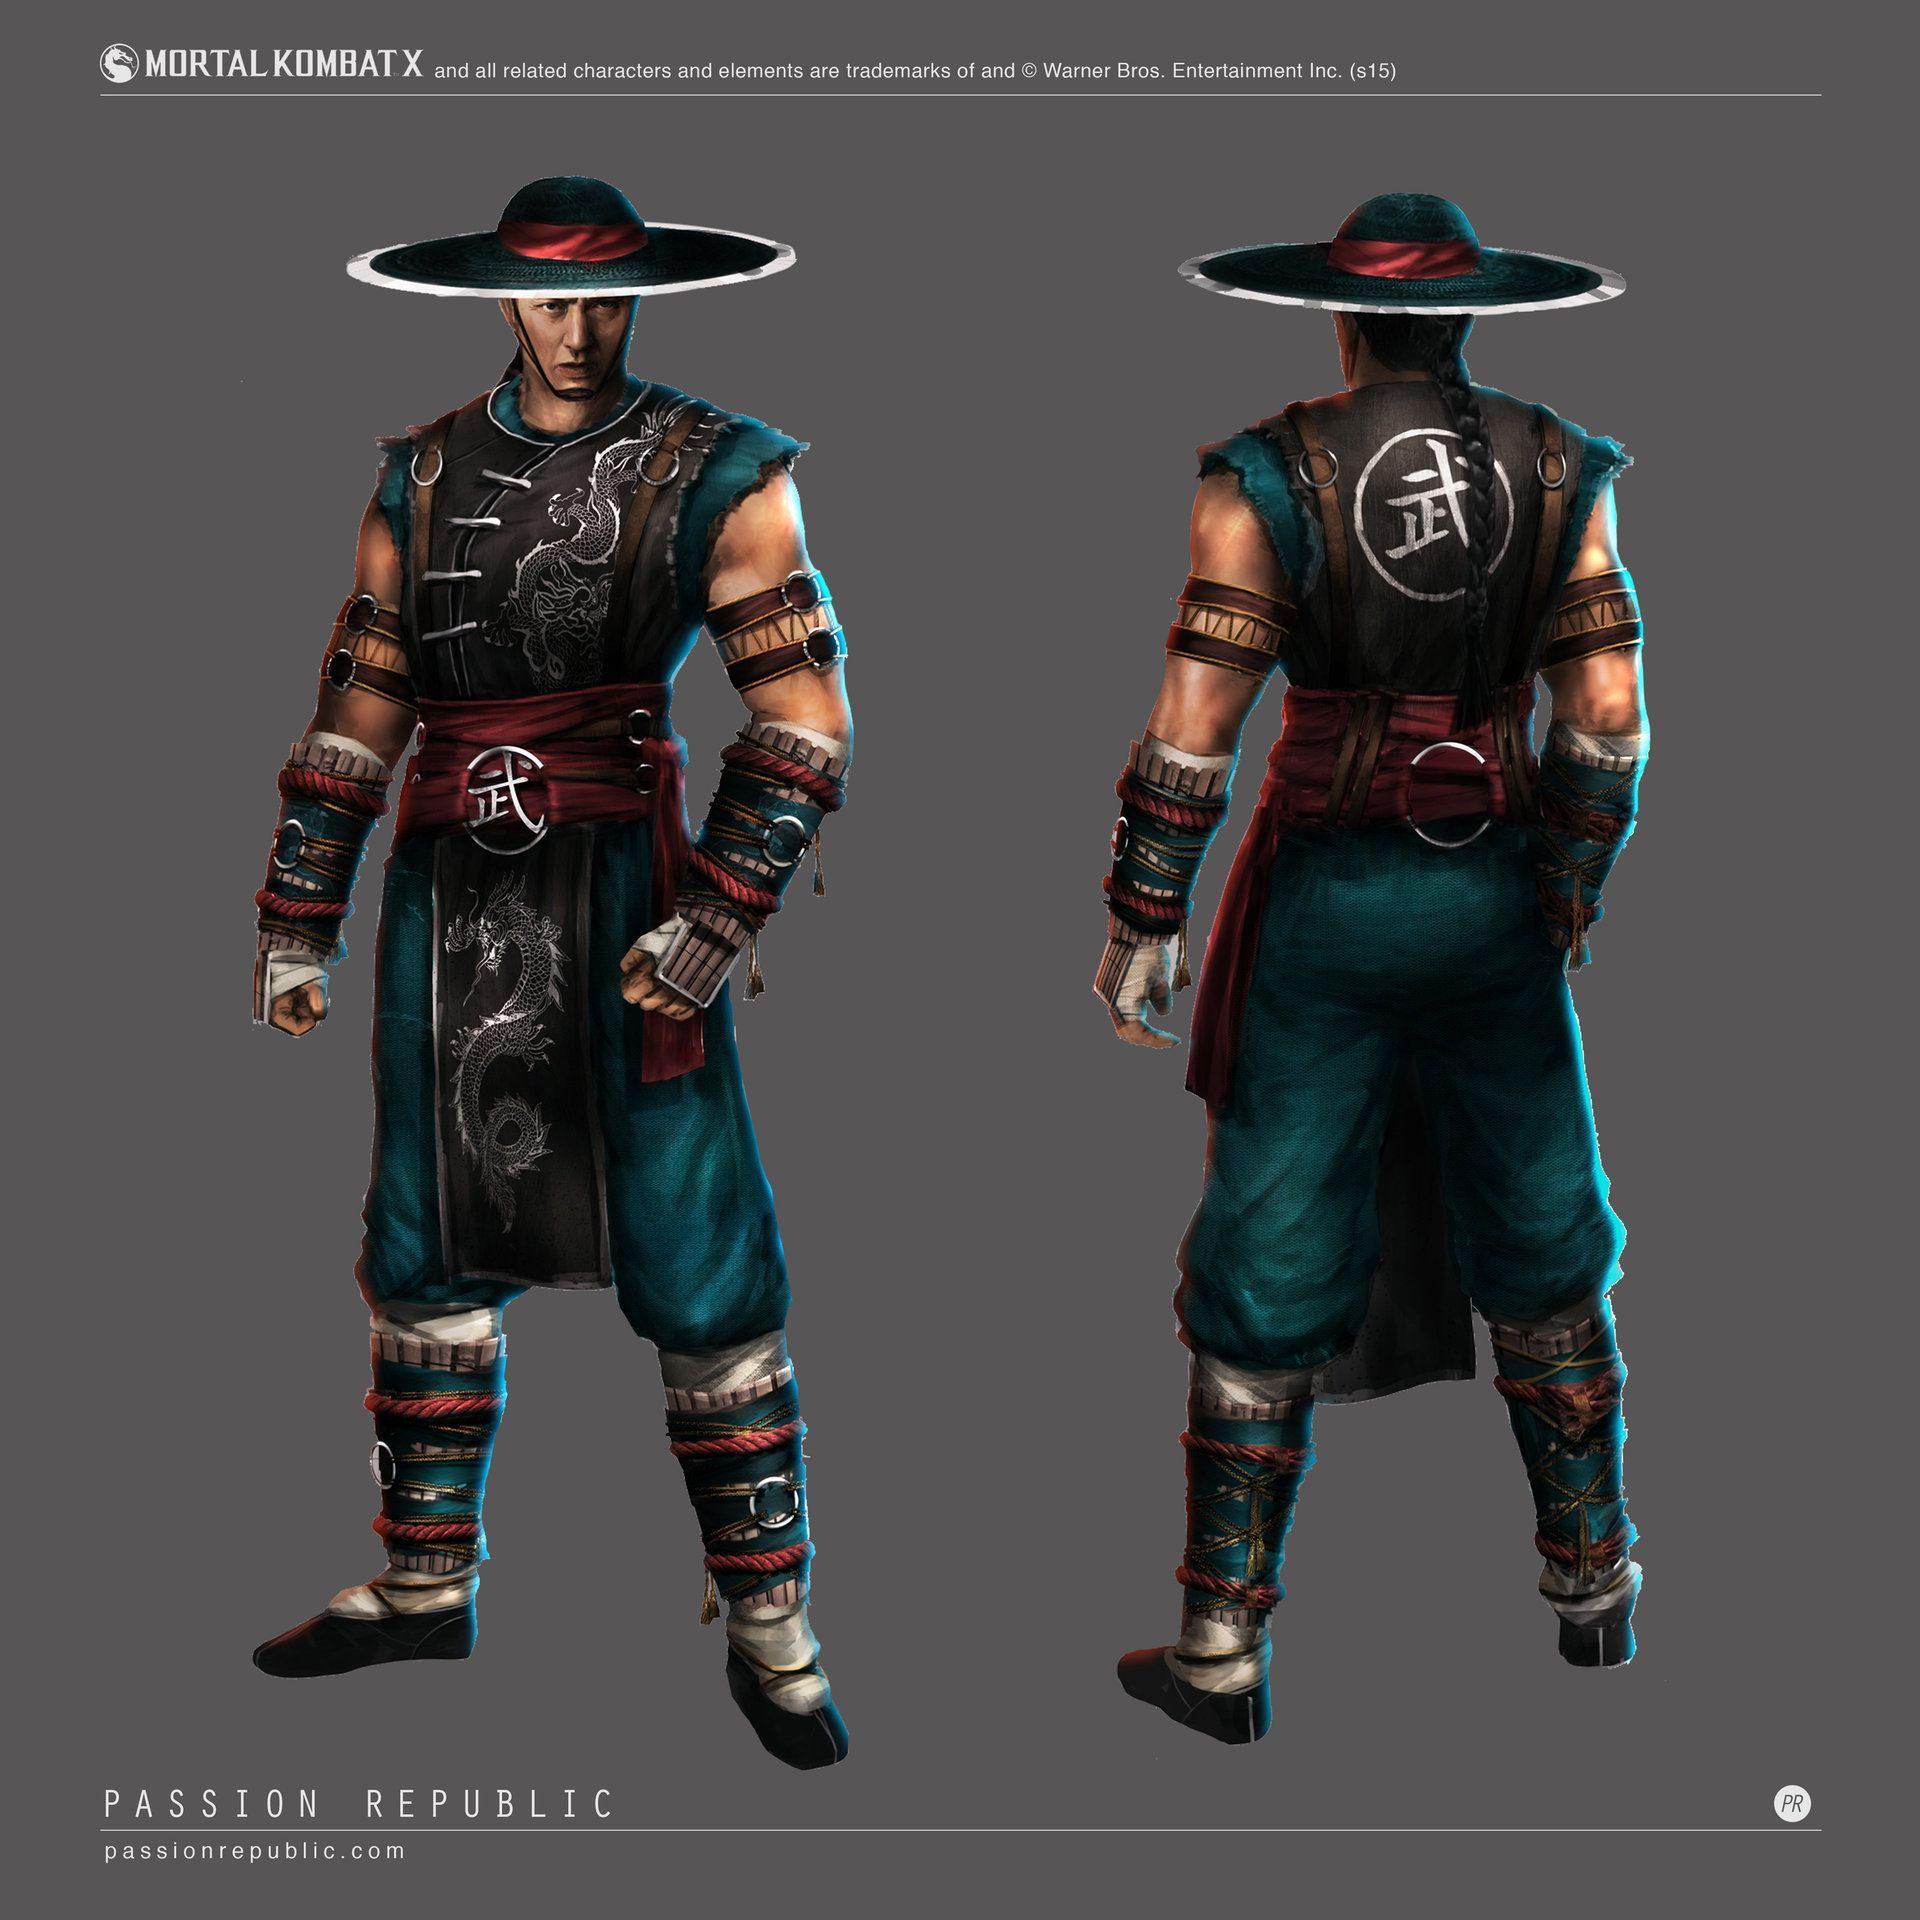 Mortal Kombat X Tournament Kung Lao Johnson Ting Mortal Kombat X Mortal Kombat Mortal Kombat Characters